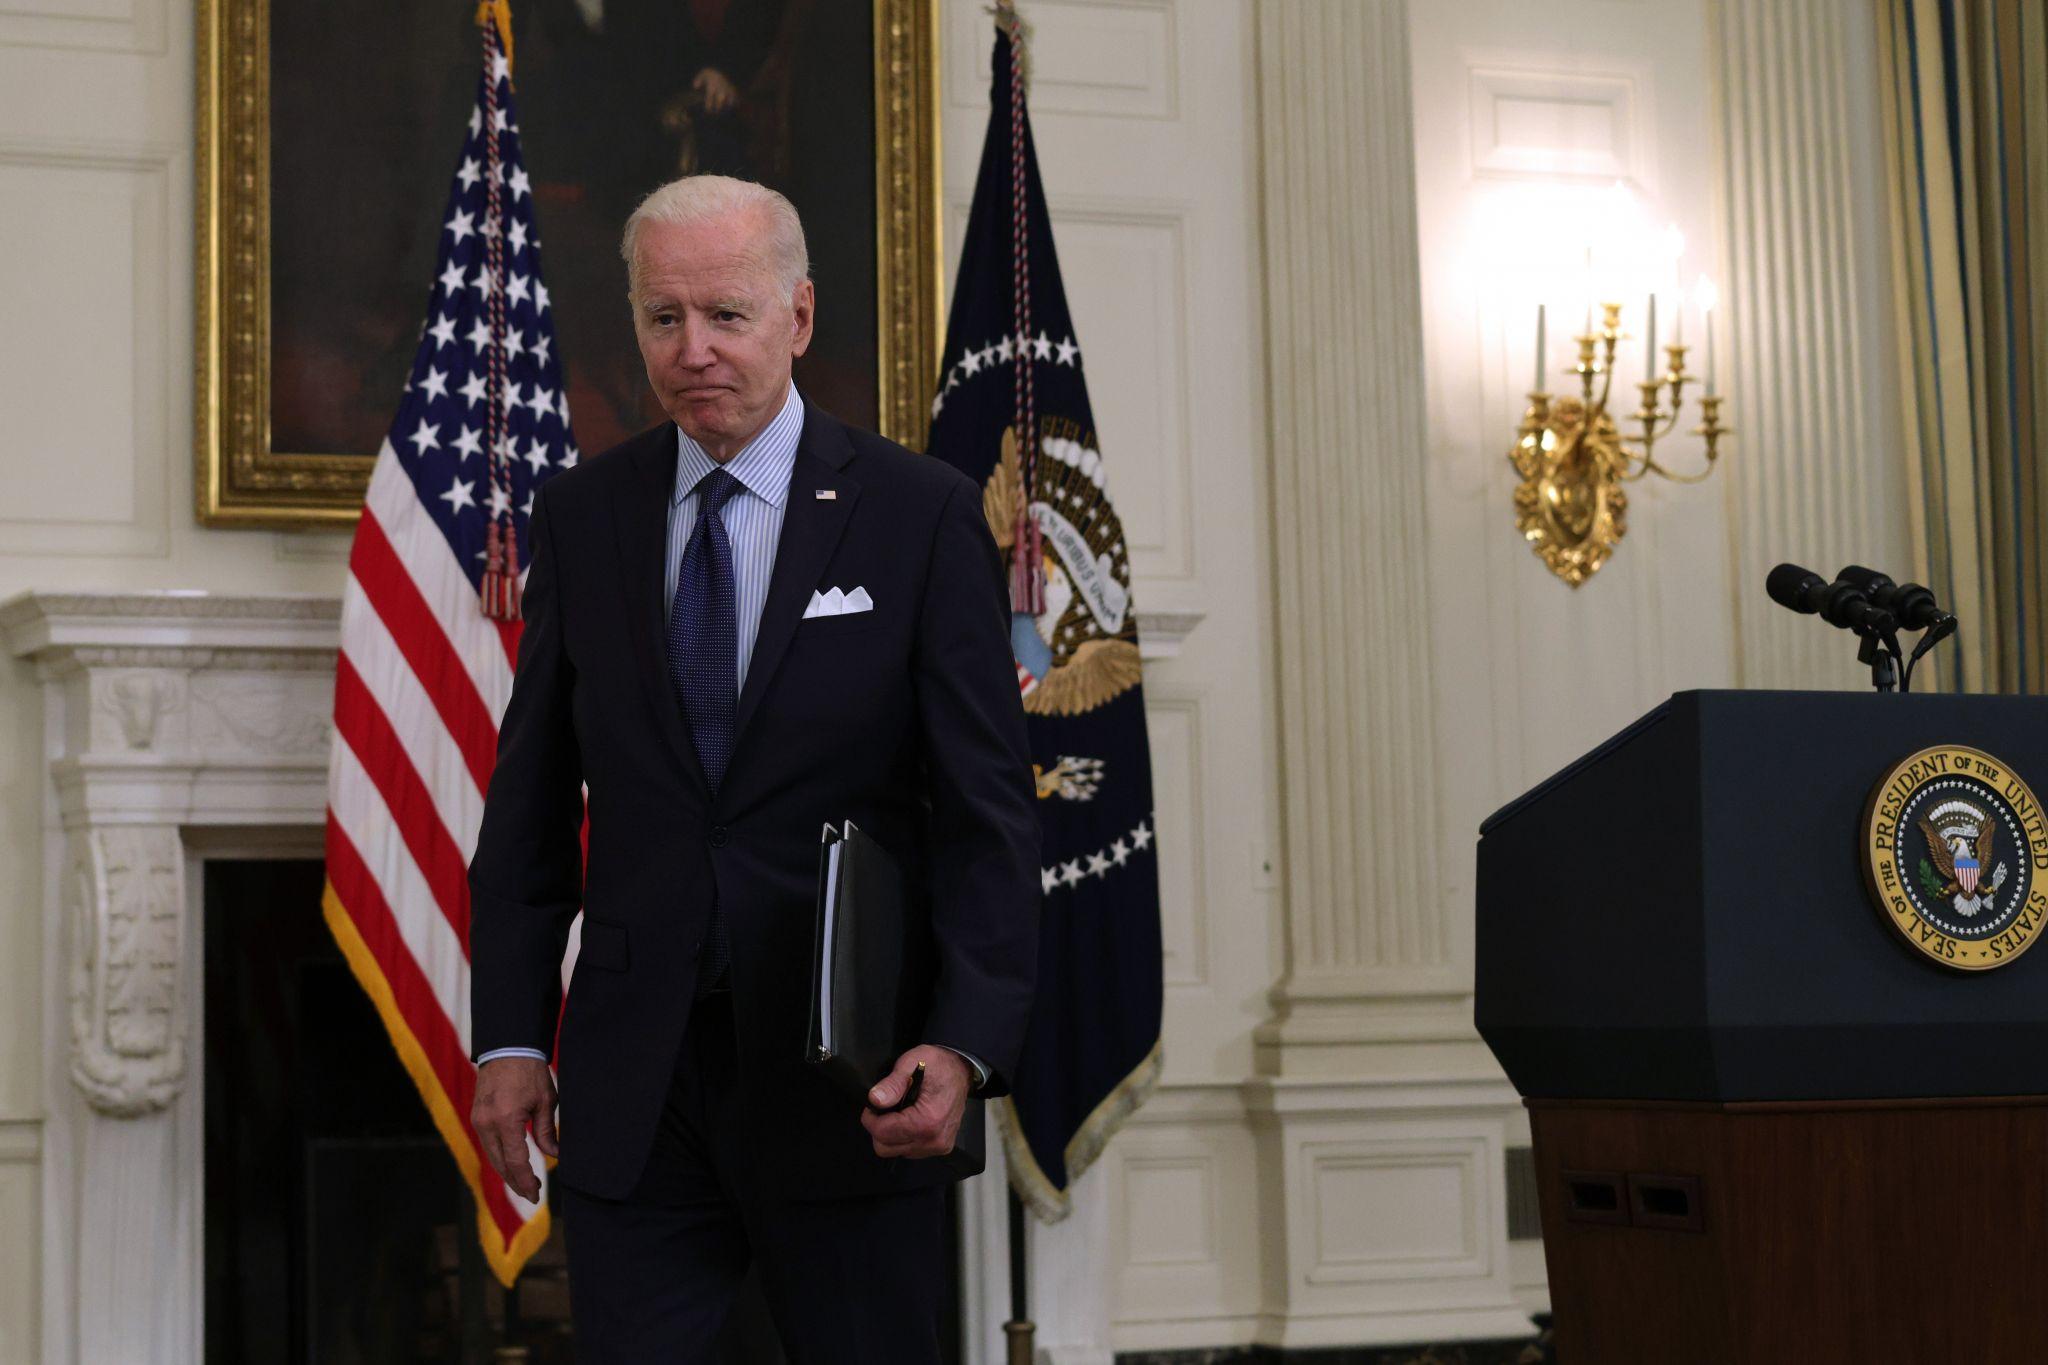 Joe Biden isn't actually this huge, right?